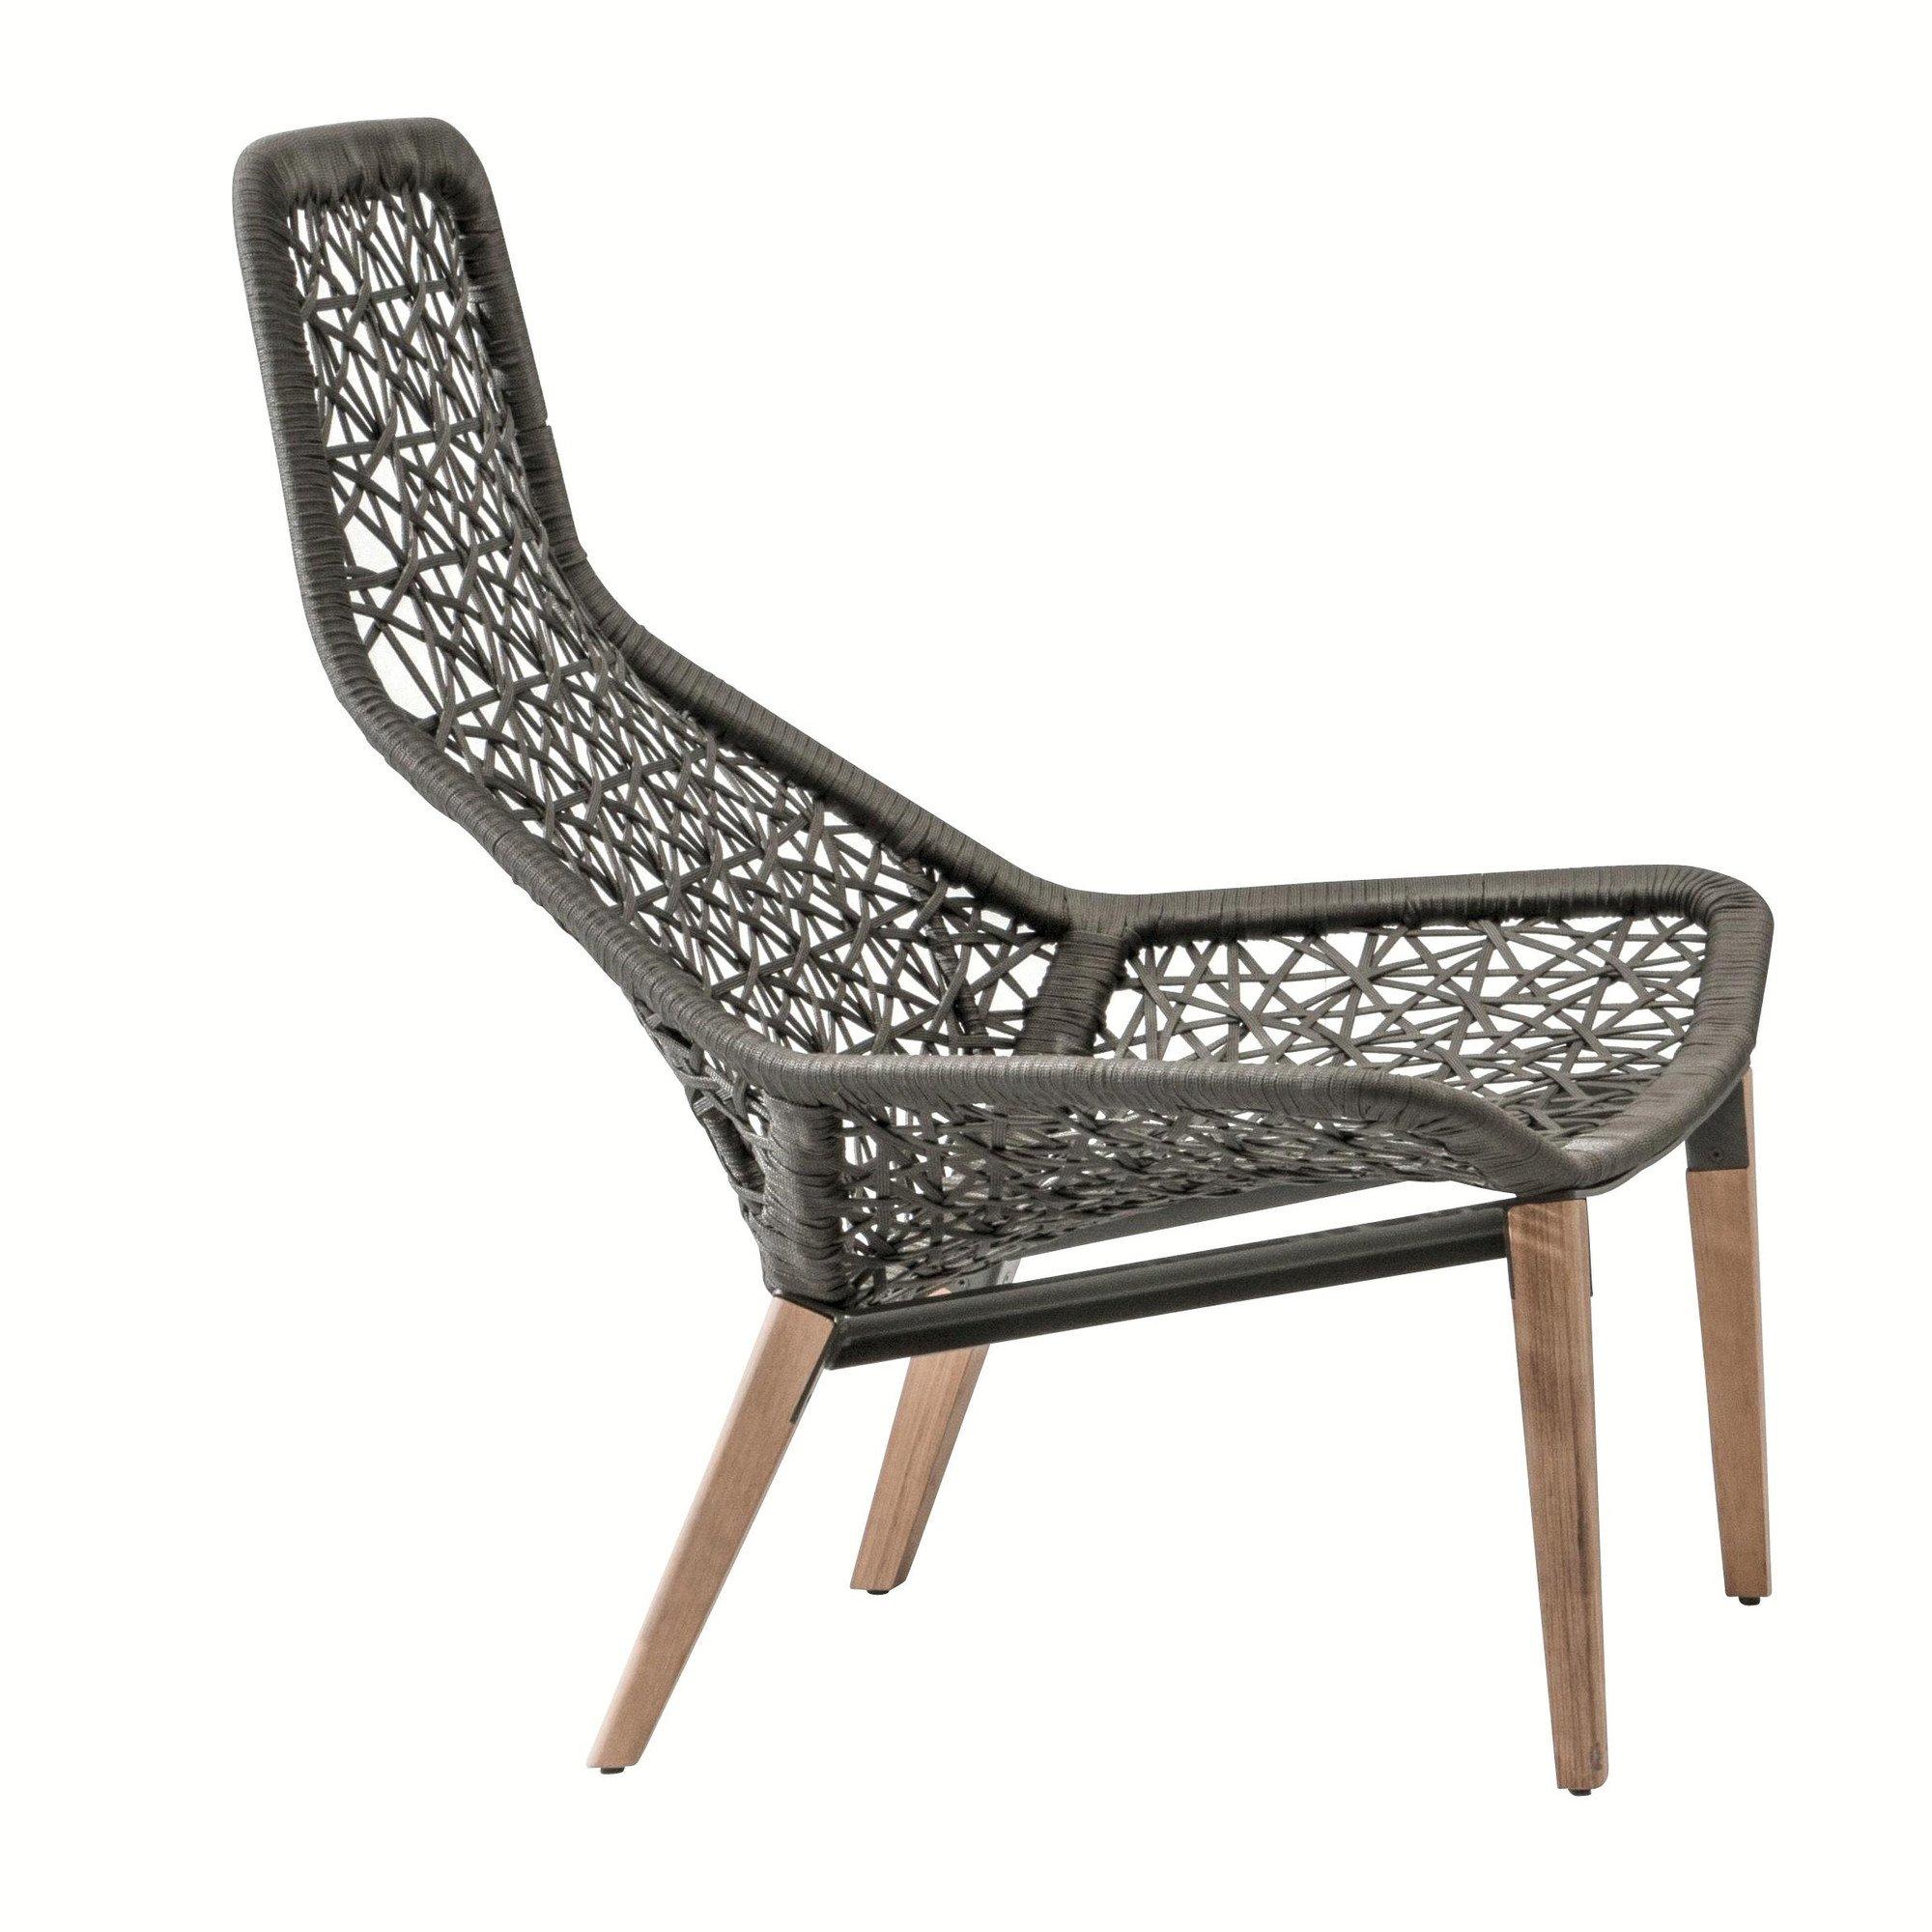 kettal maia relax fauteuil de jardin pi tement en ambientedirect. Black Bedroom Furniture Sets. Home Design Ideas